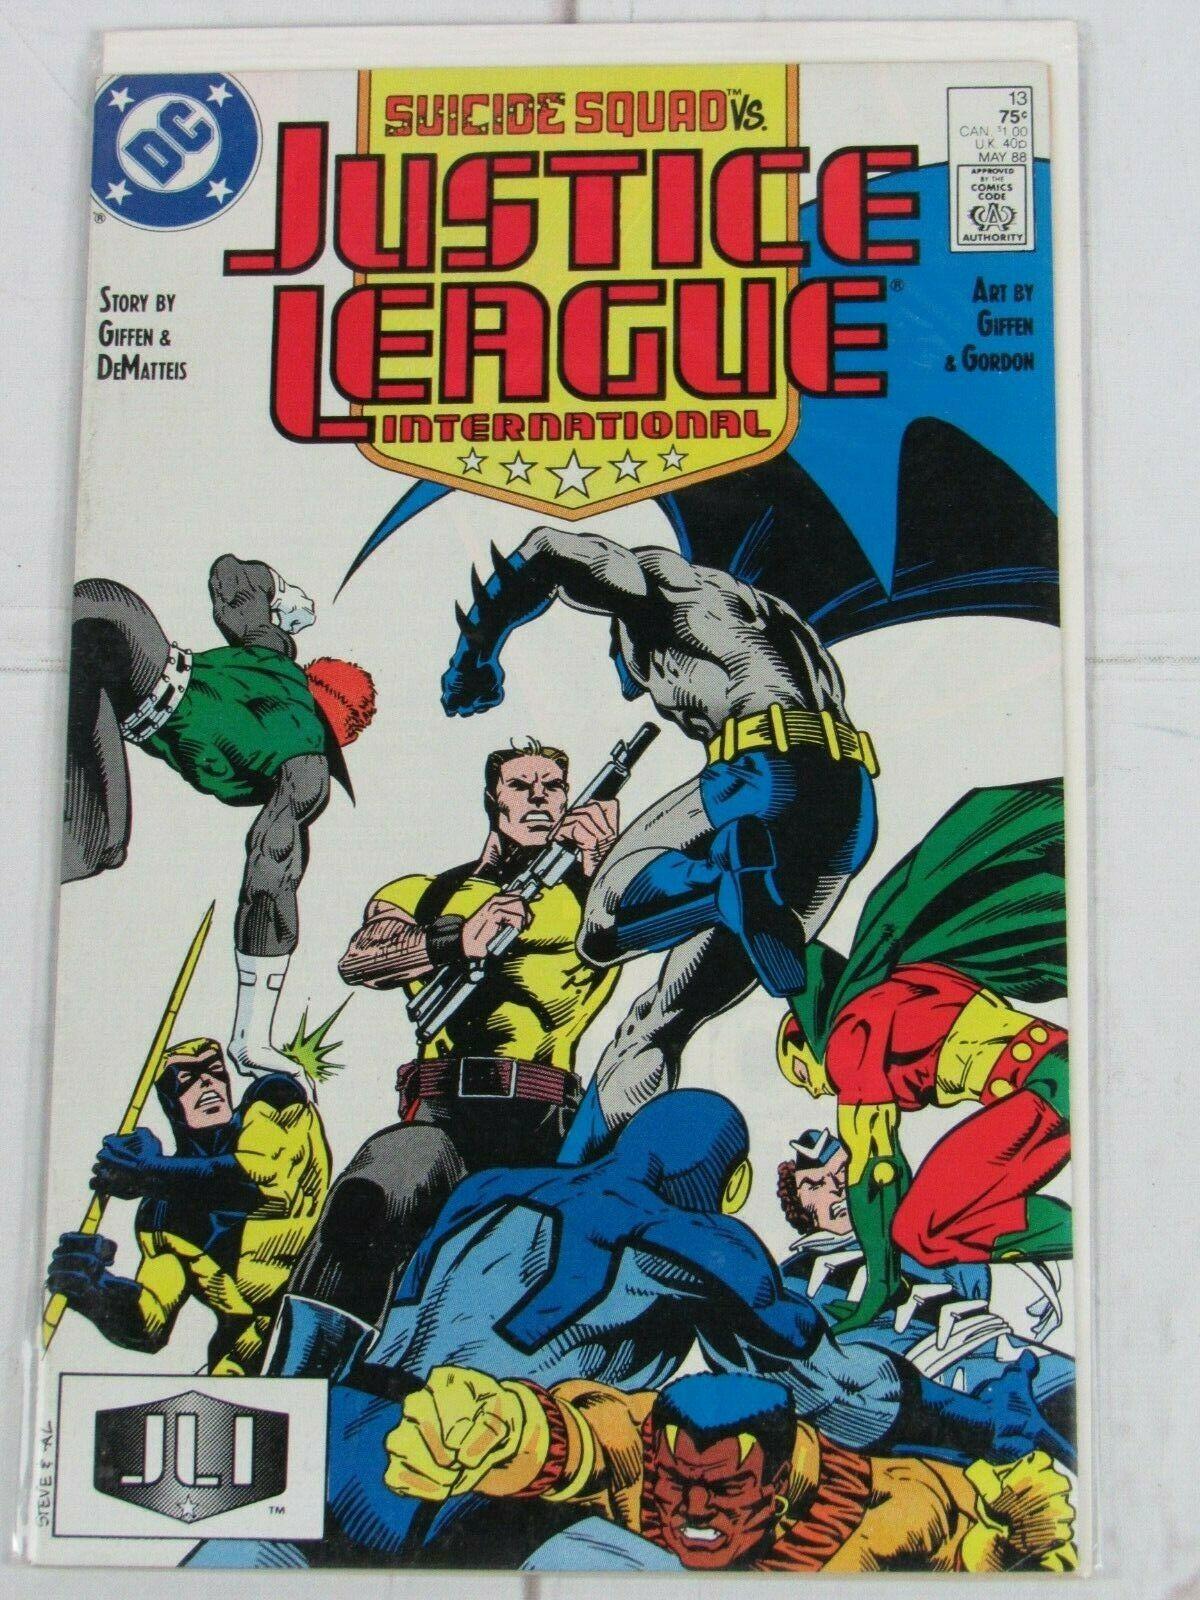 JUSTICE LEAGUE INTERNATIONAL #13 (MAY 1988) DC COMICS - C4986